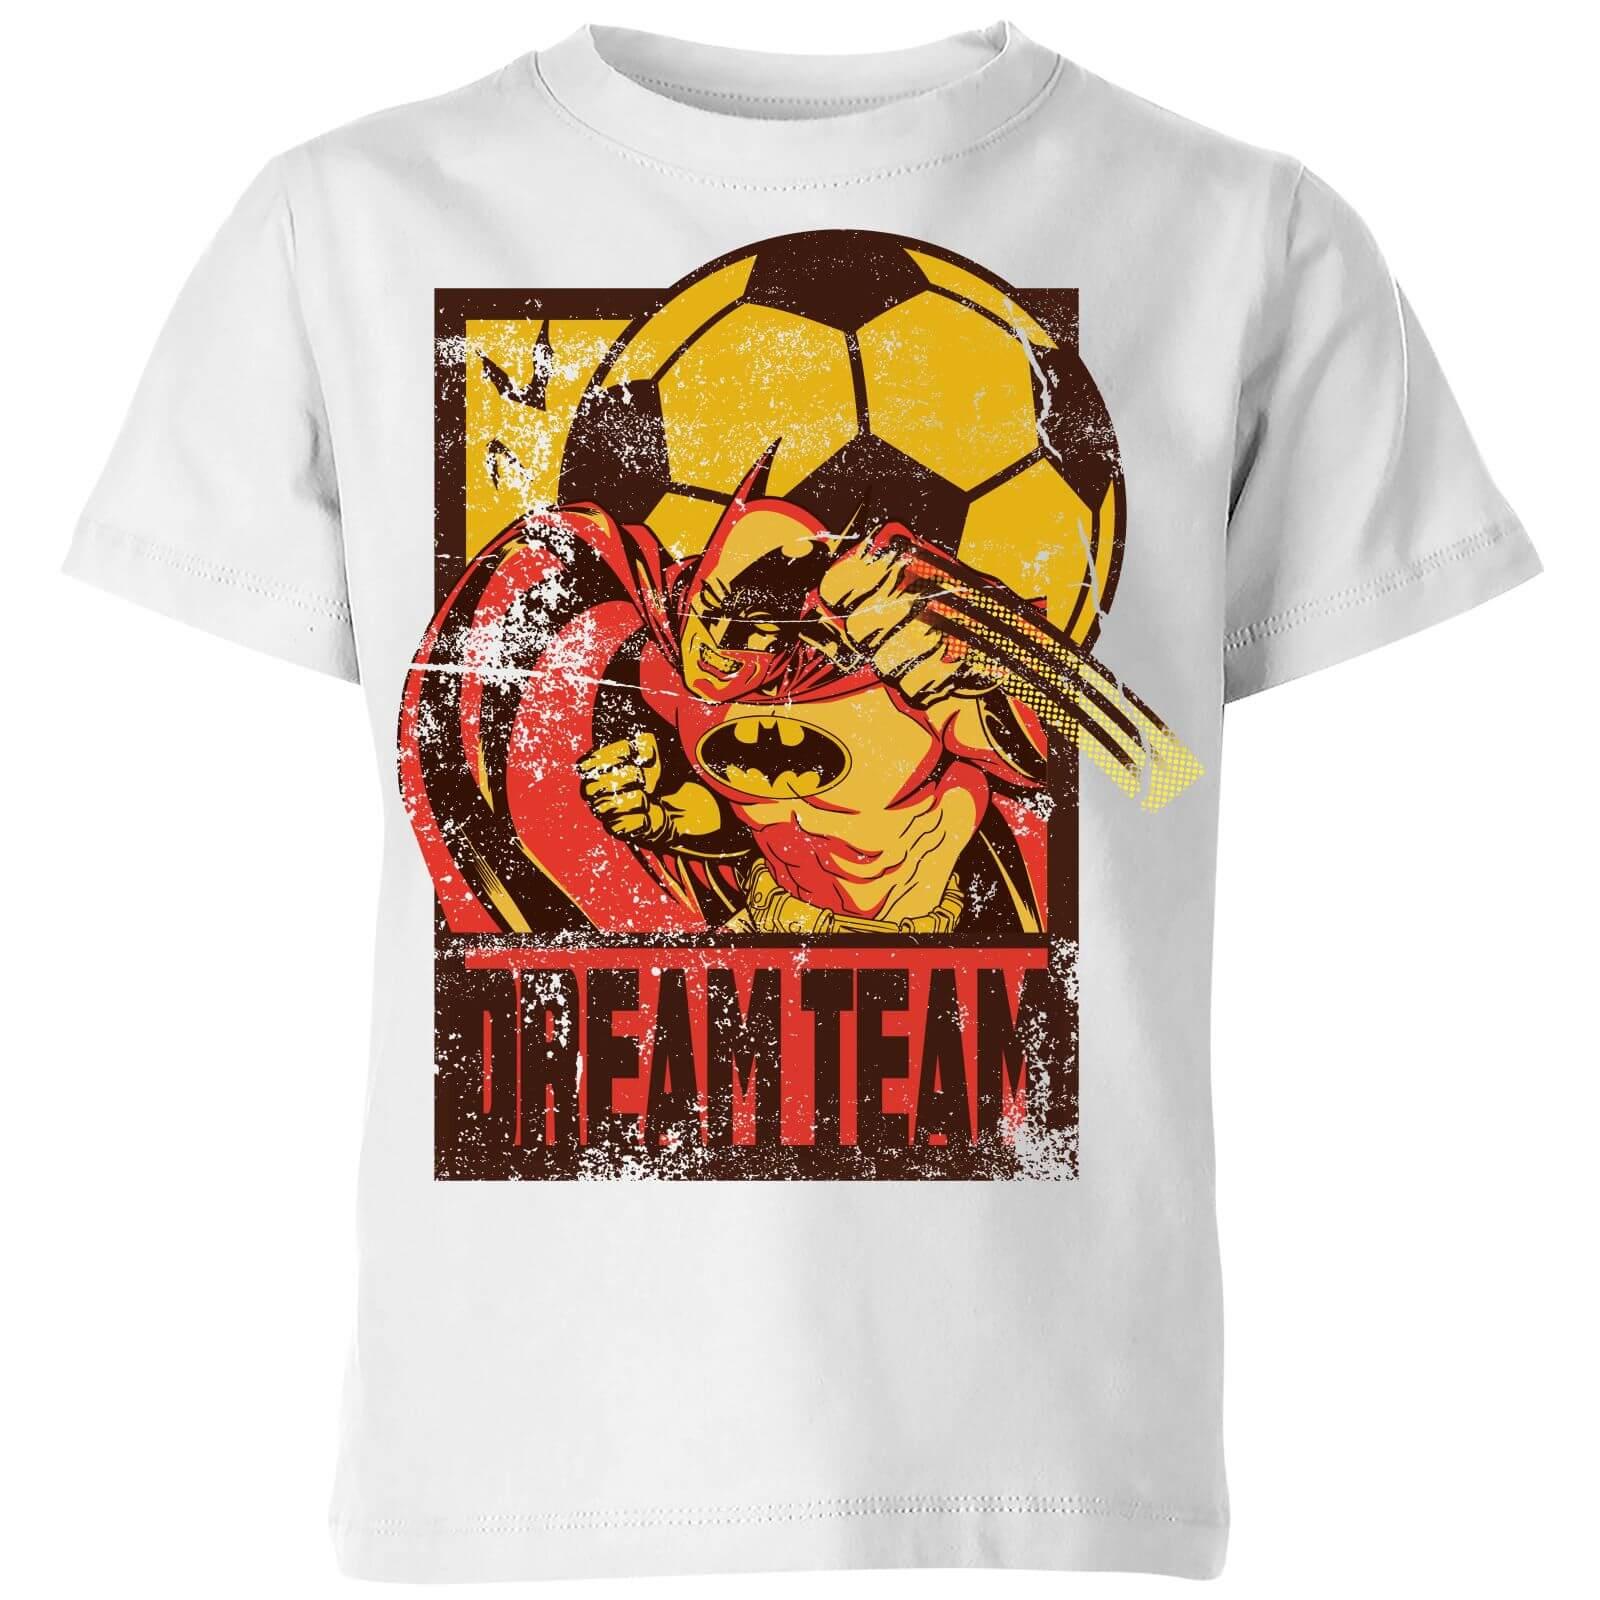 OfferteWeb.click 49-dc-batman-dream-team-punch-kids-t-shirt-white-11-12